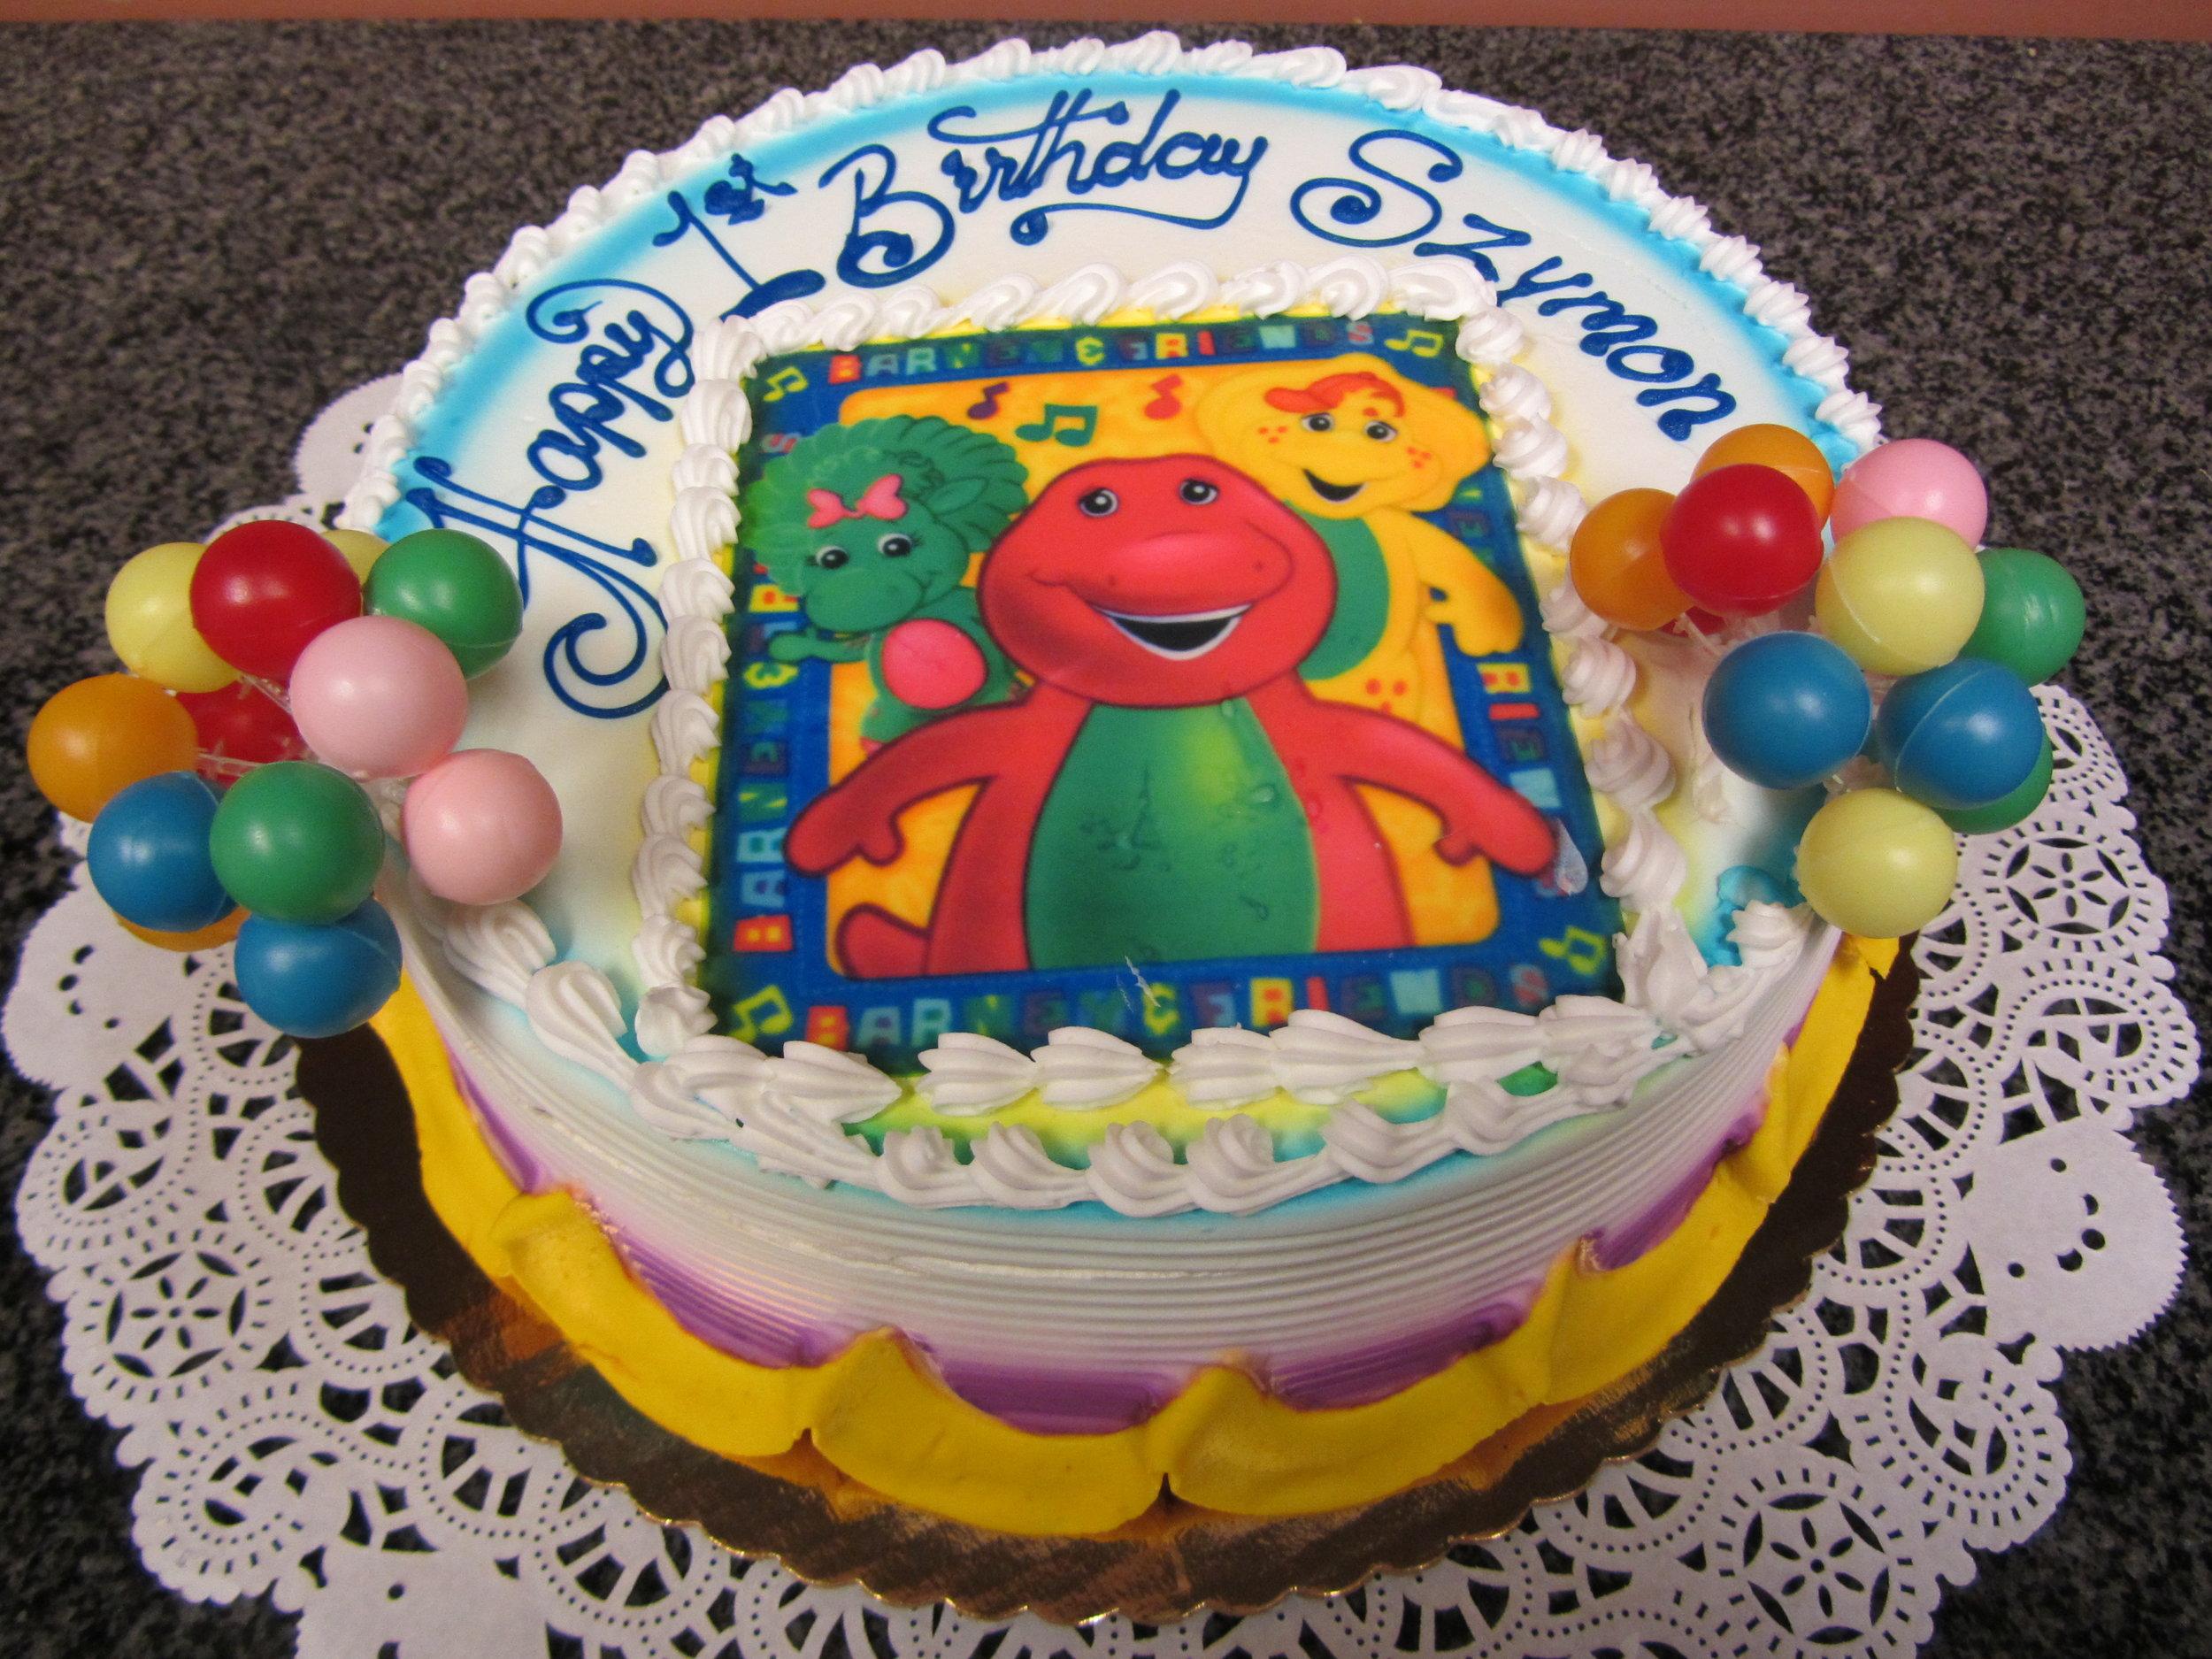 Cake 55